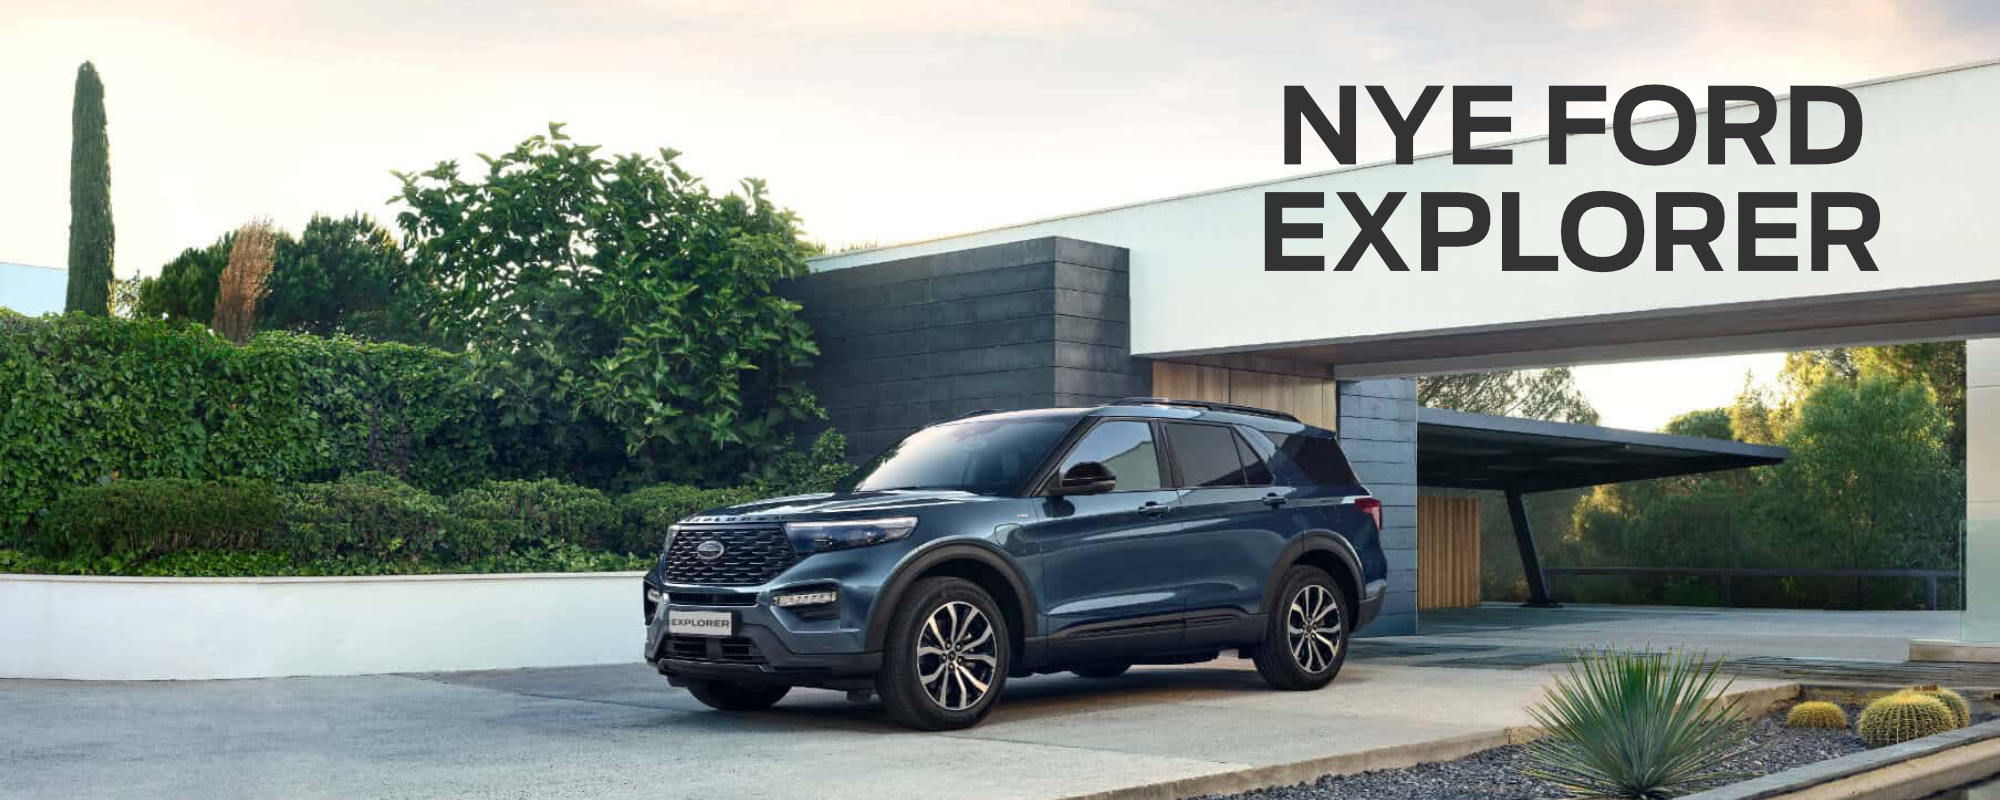 Nye Ford explorer ladbar hybrid